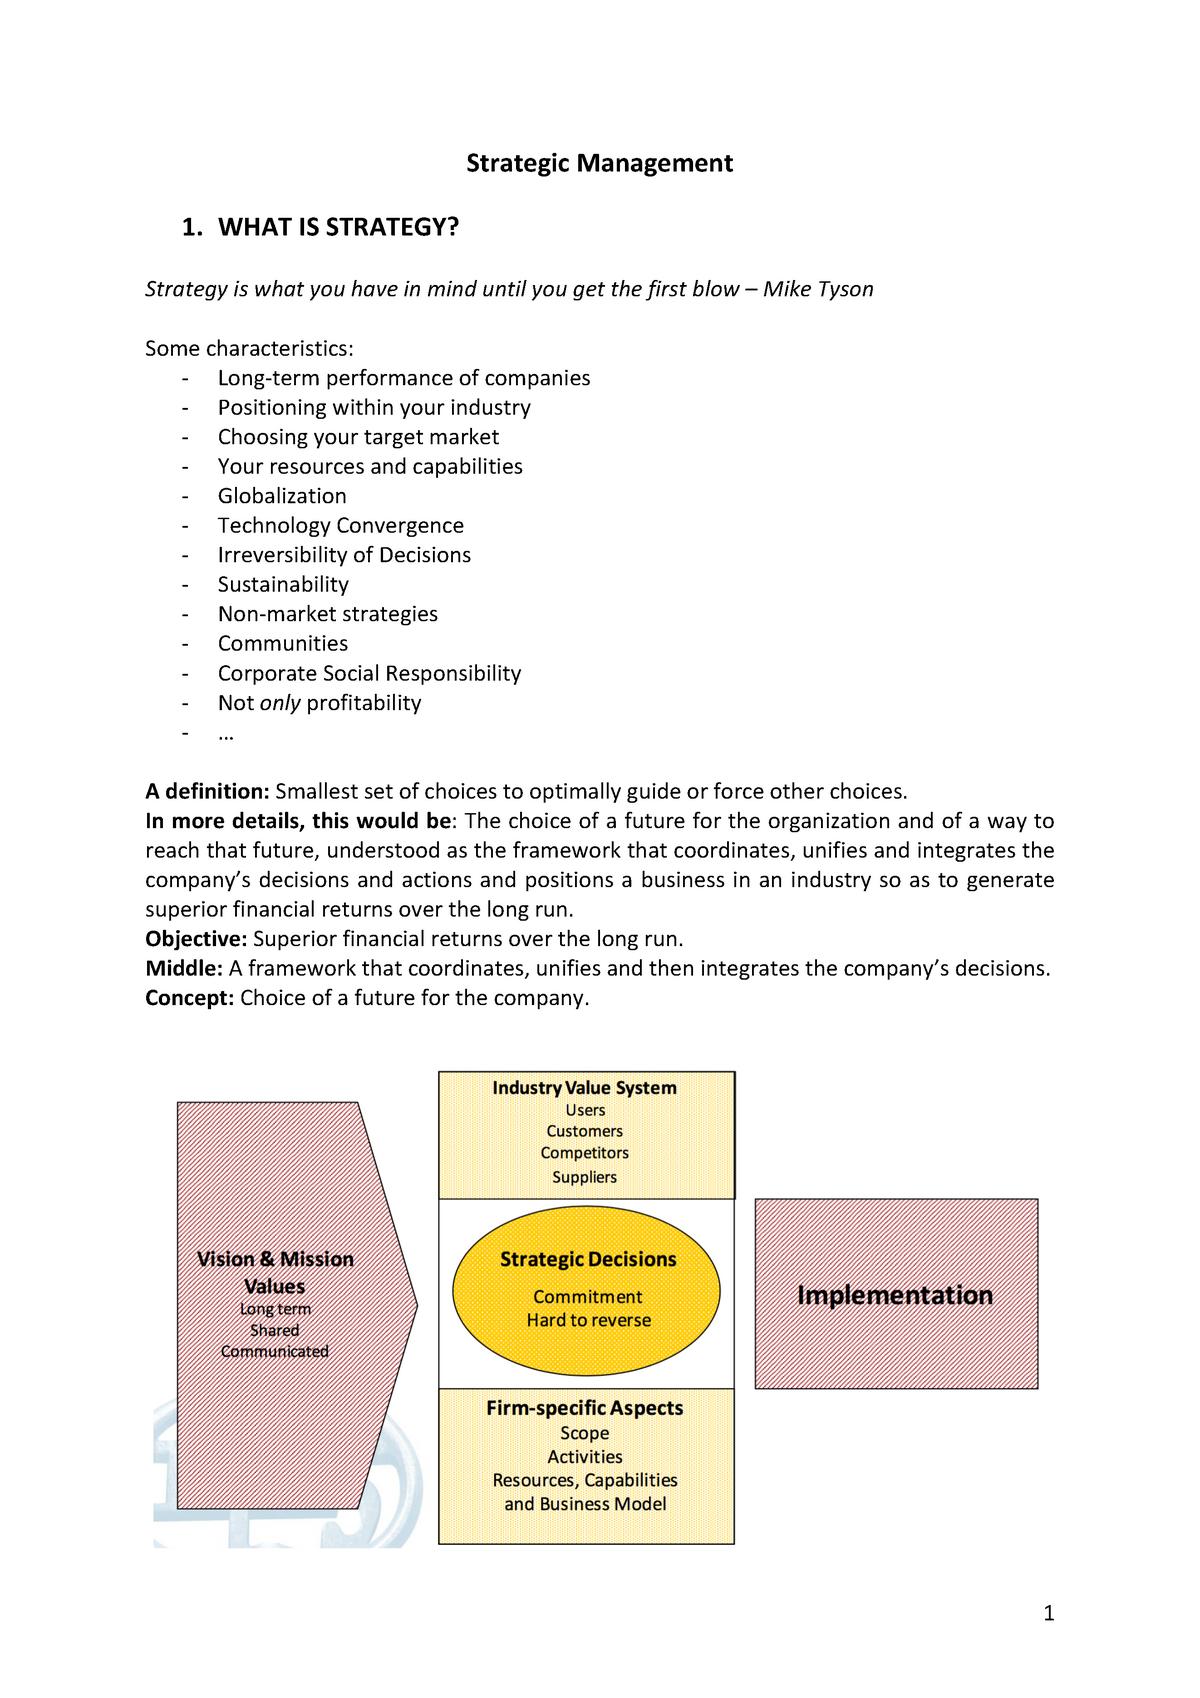 Strategic Management PDF - D0R04A - StuDocu